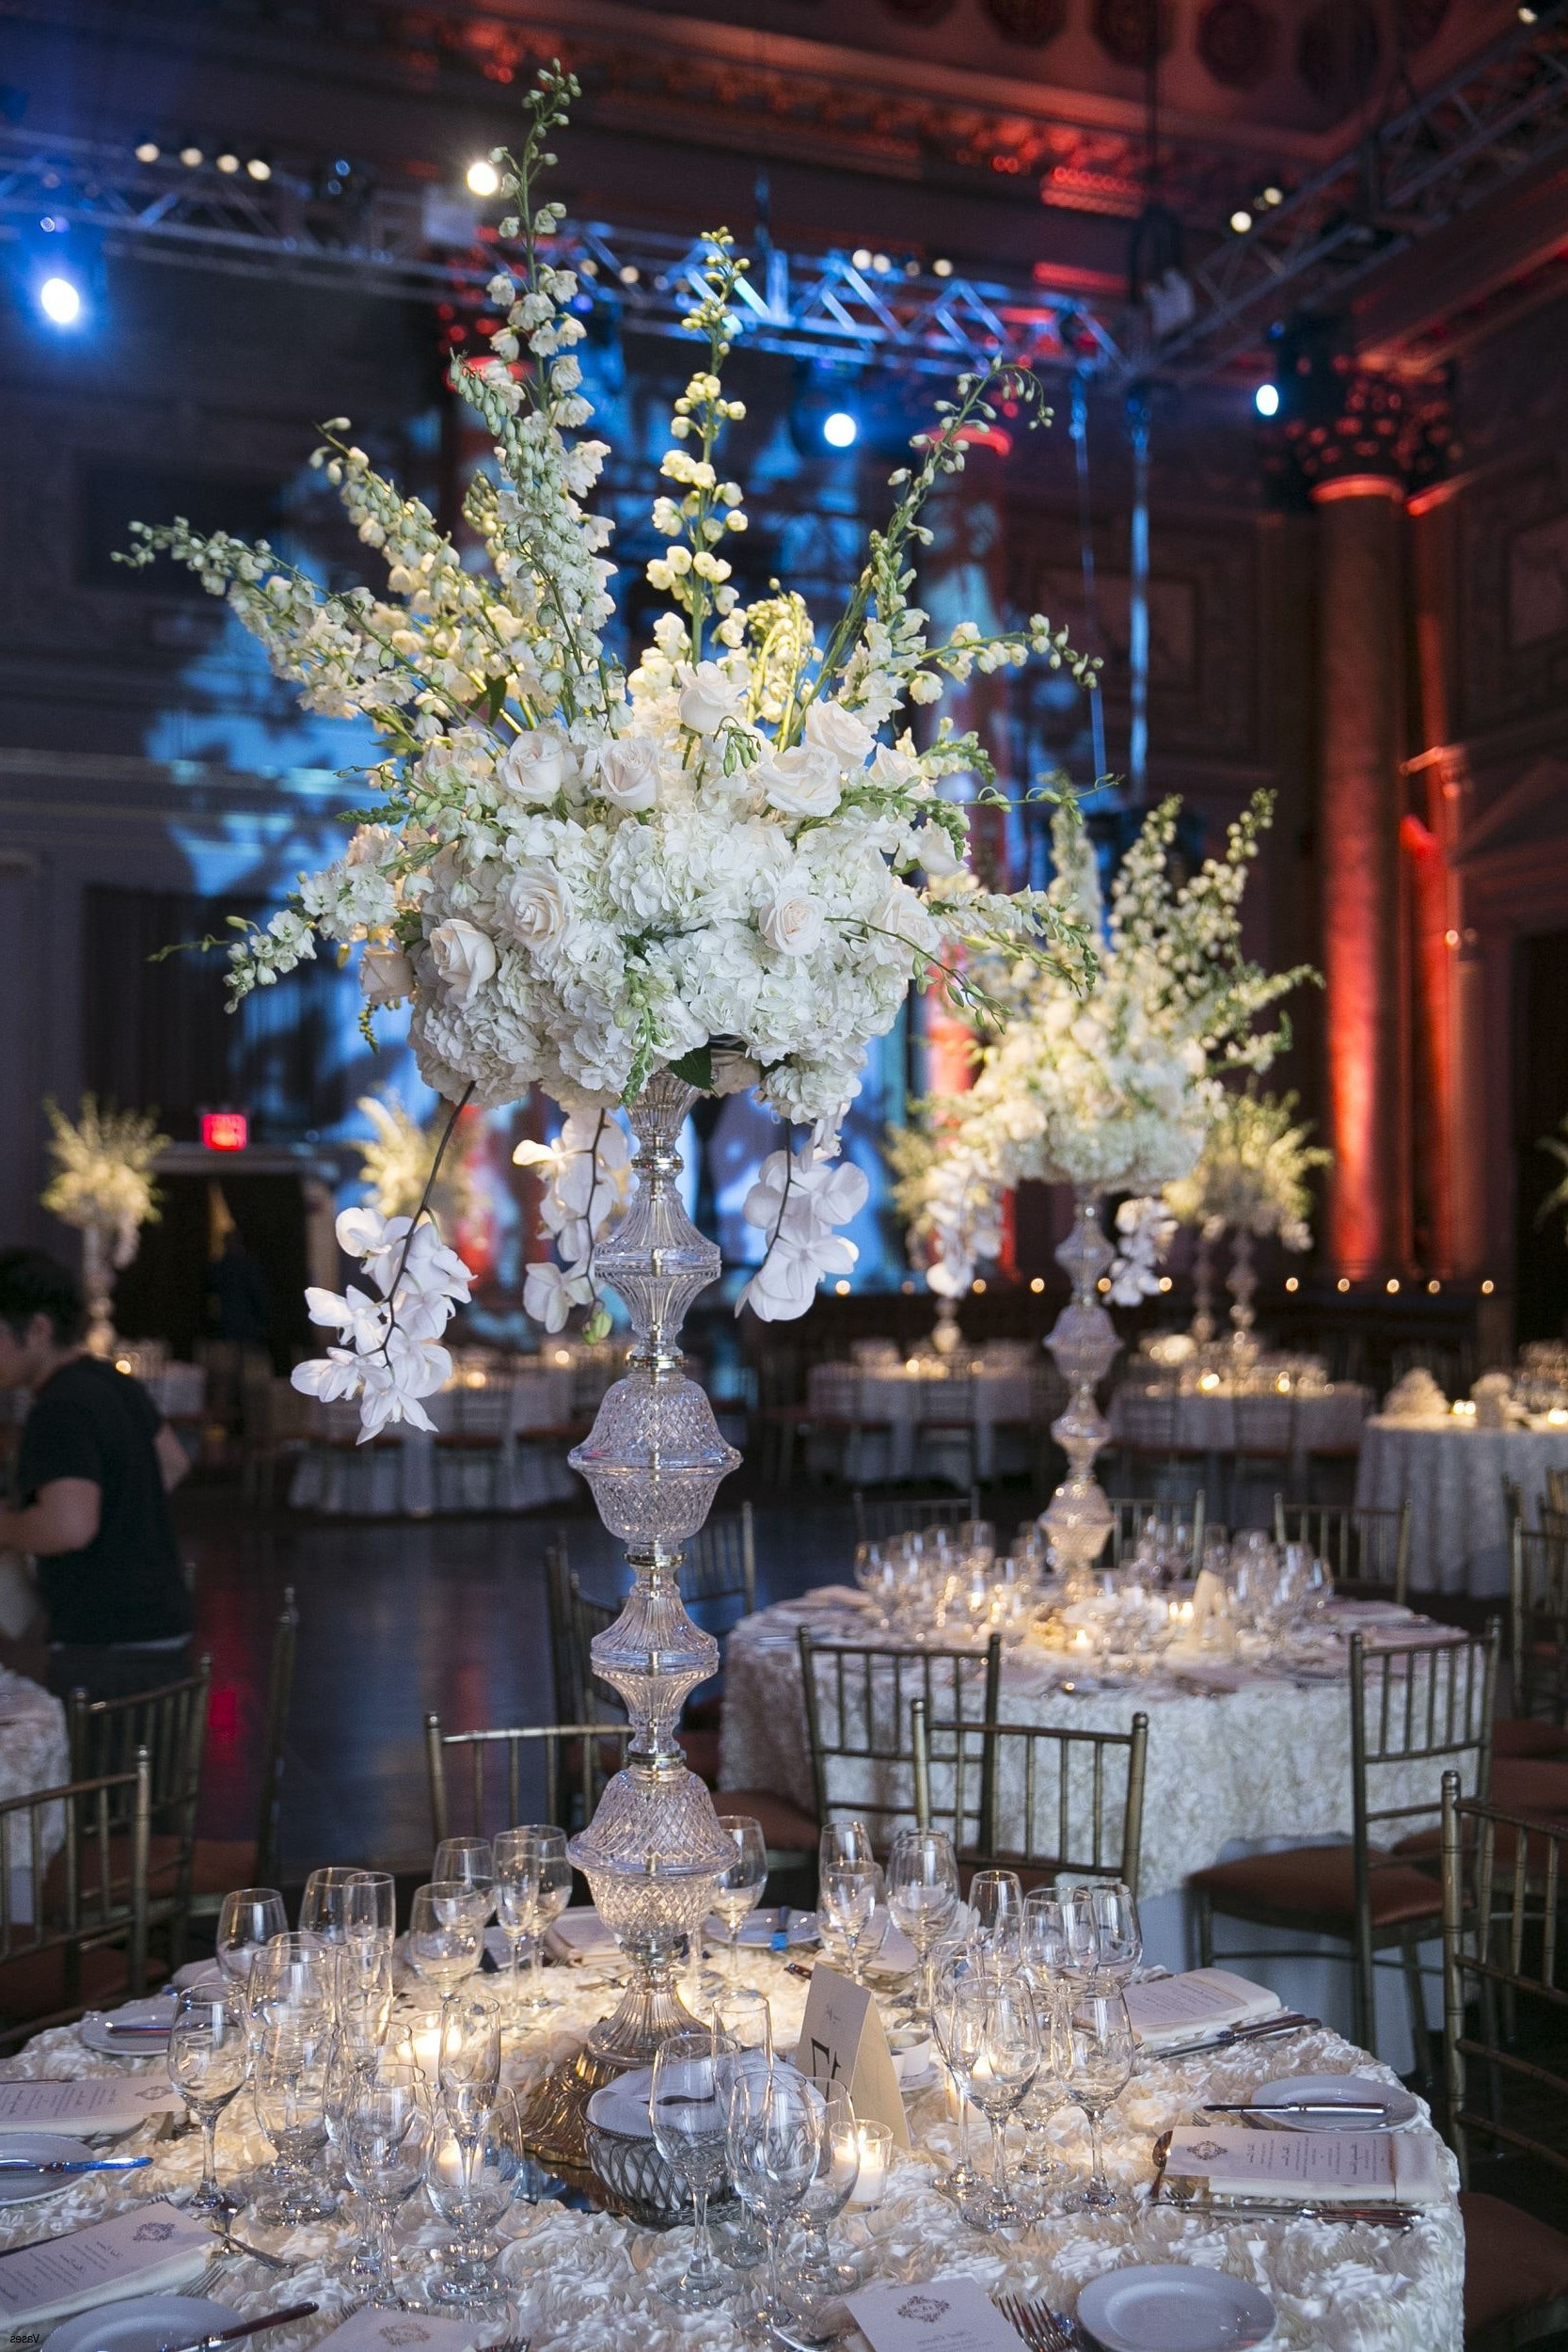 Glass Candy Vases Of 10 Fresh Crystal Vase Bogekompresorturkiye Com Pertaining to Crystal Beads for Wedding Decoration Elegant Vases Tall Crystal Wedding Winter Centerpiecesi 0d Beaded for